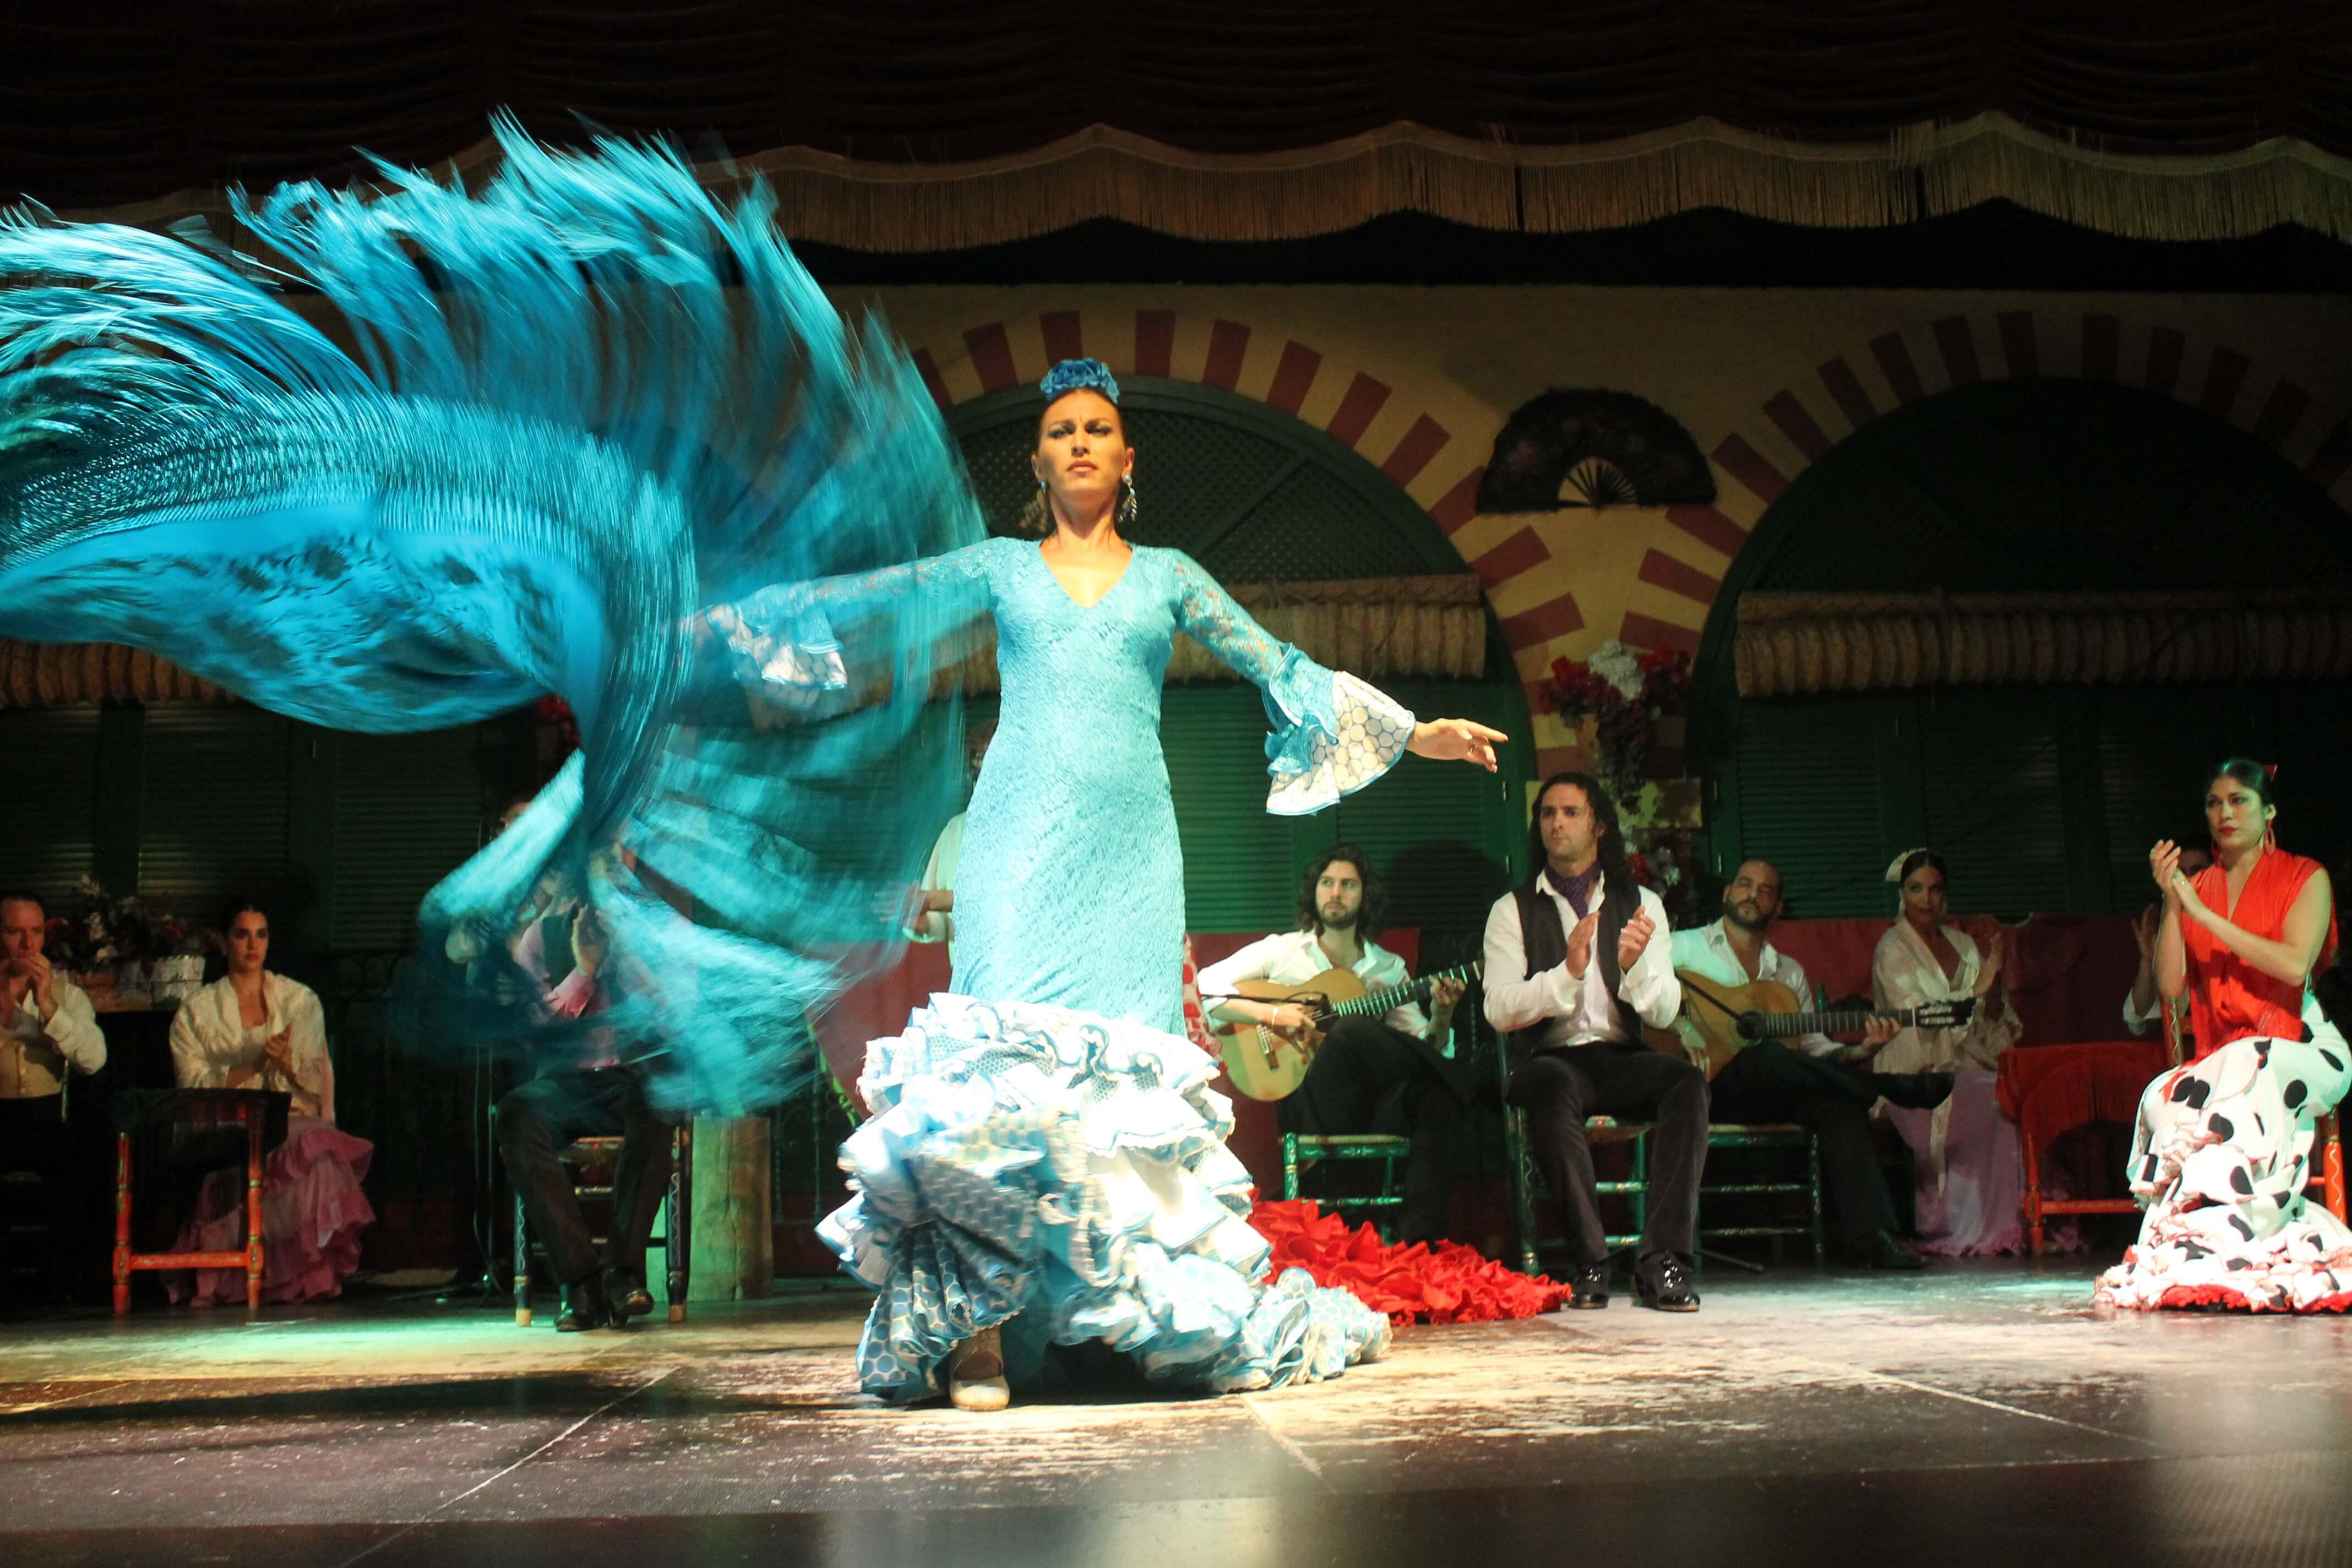 Flamenco and emotions